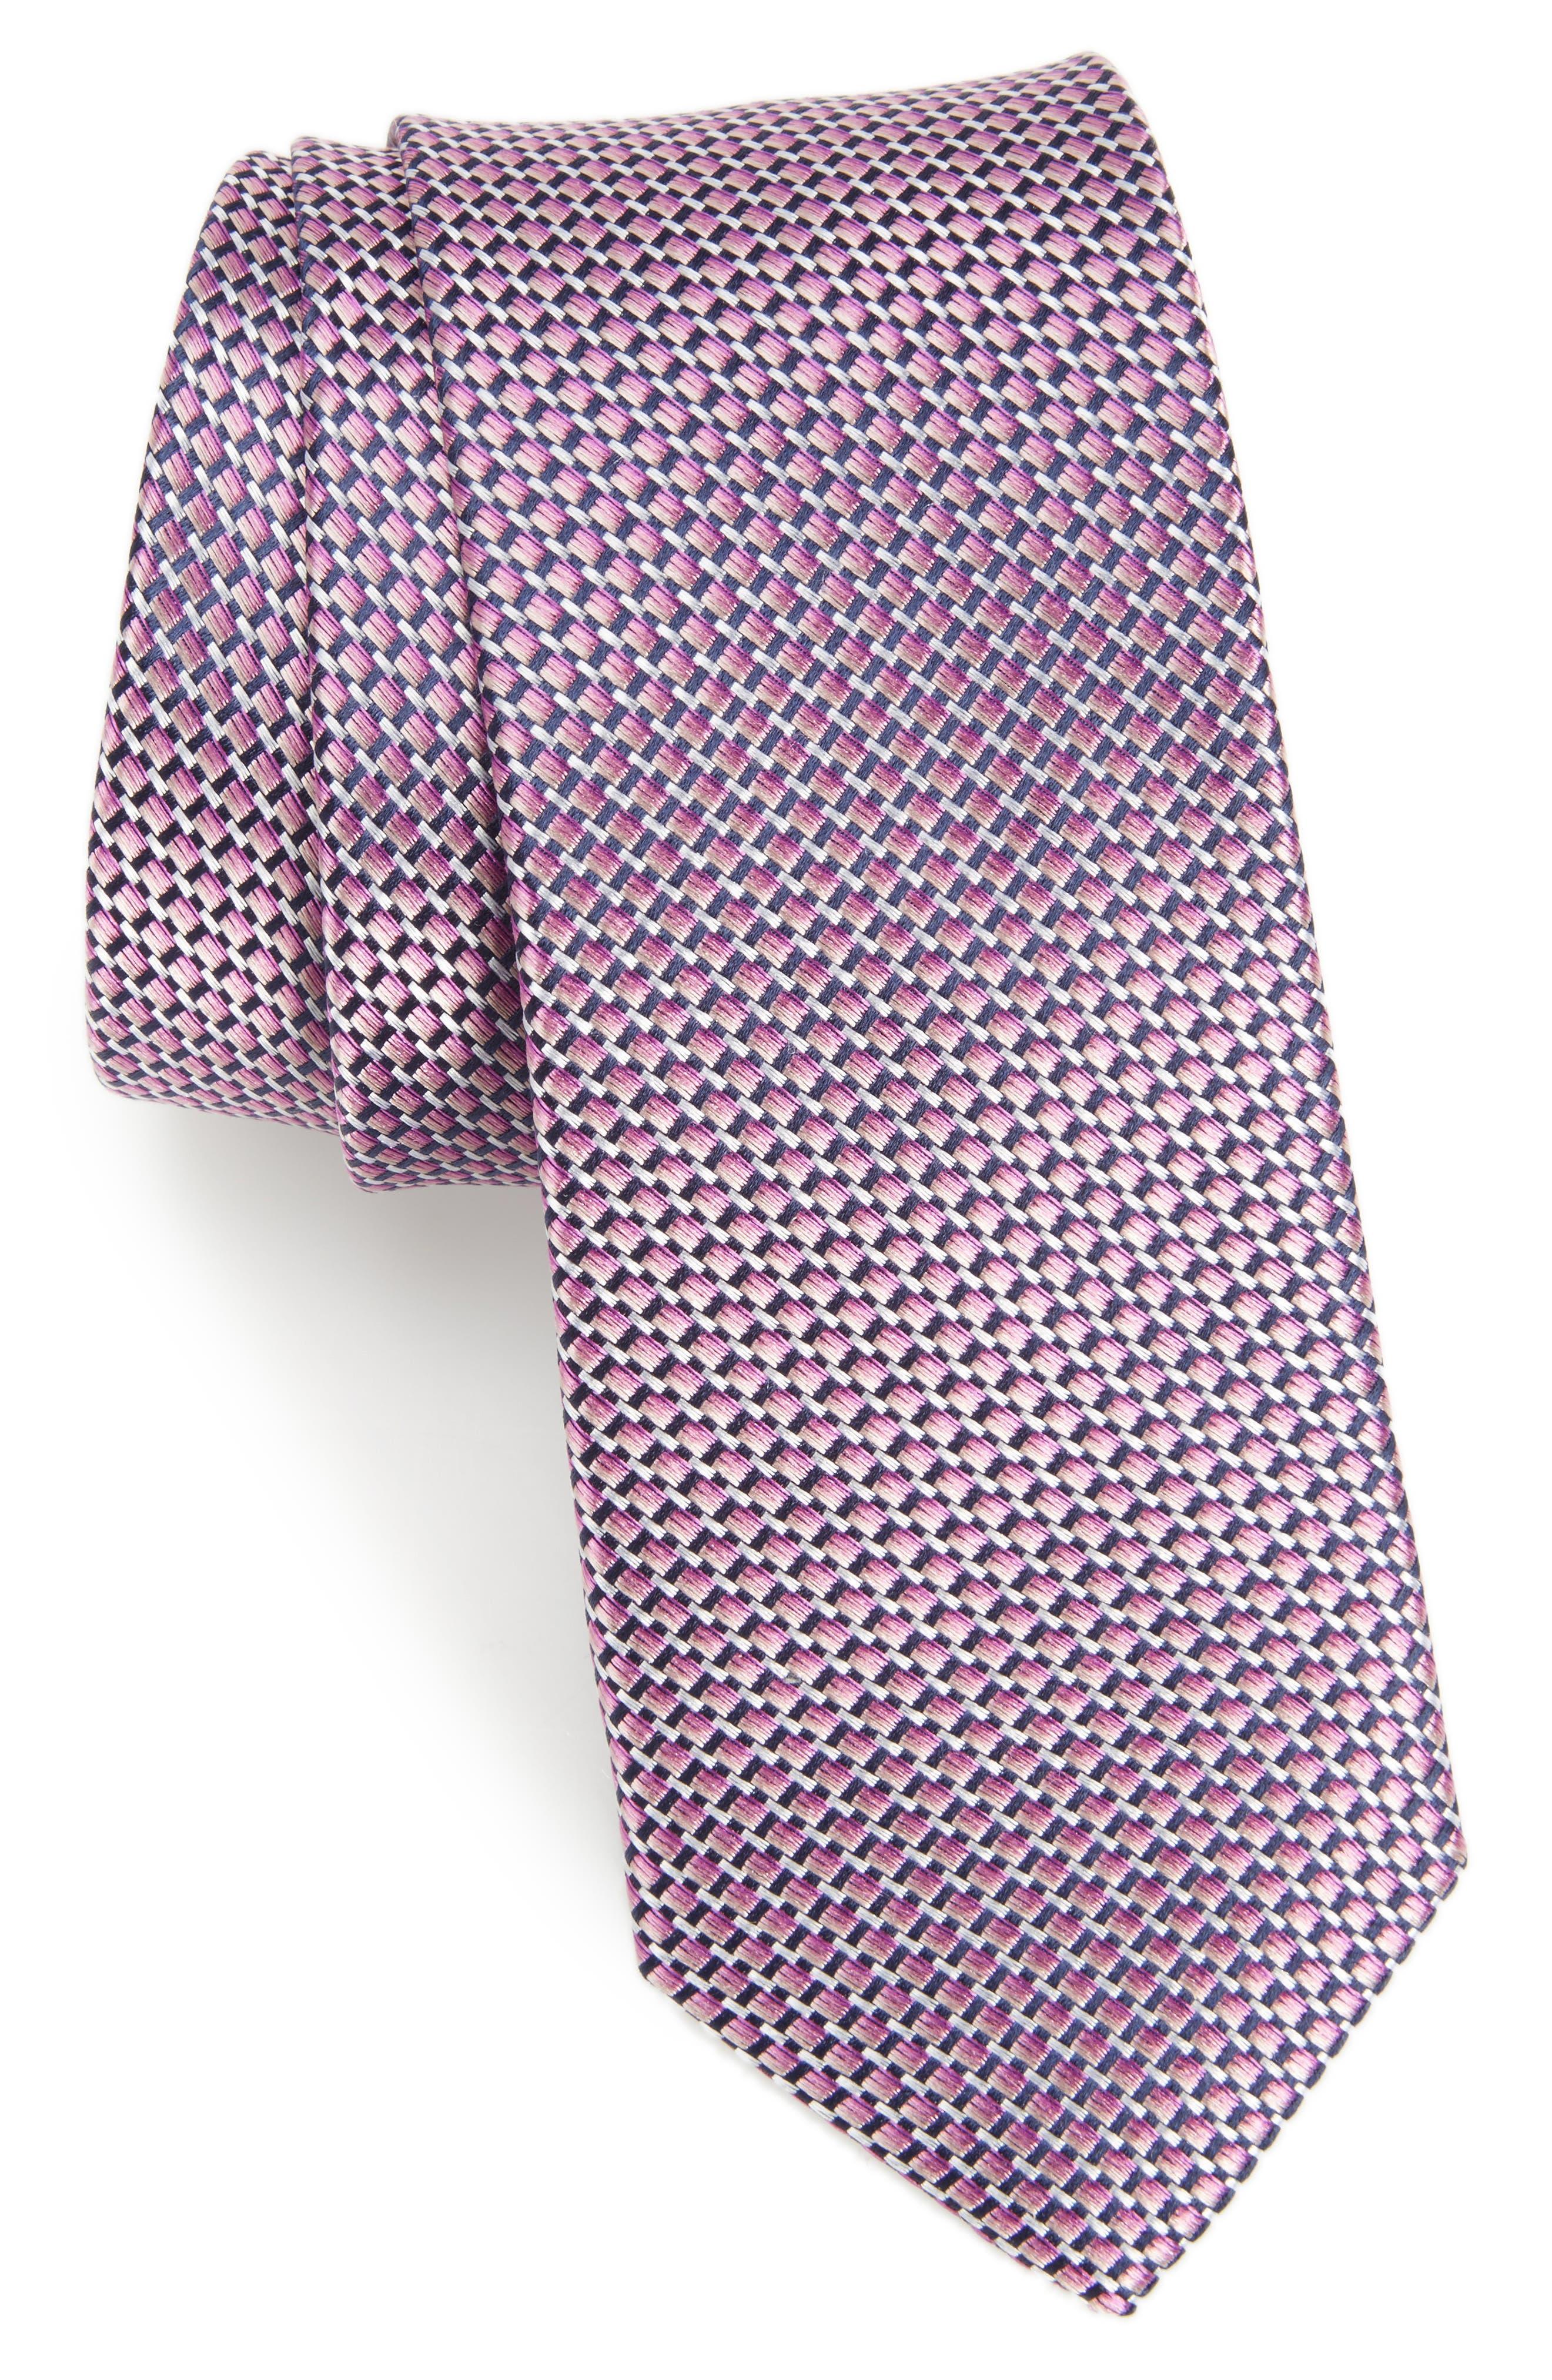 NORDSTROM MENS SHOP Iris Solid Silk Skinny Tie